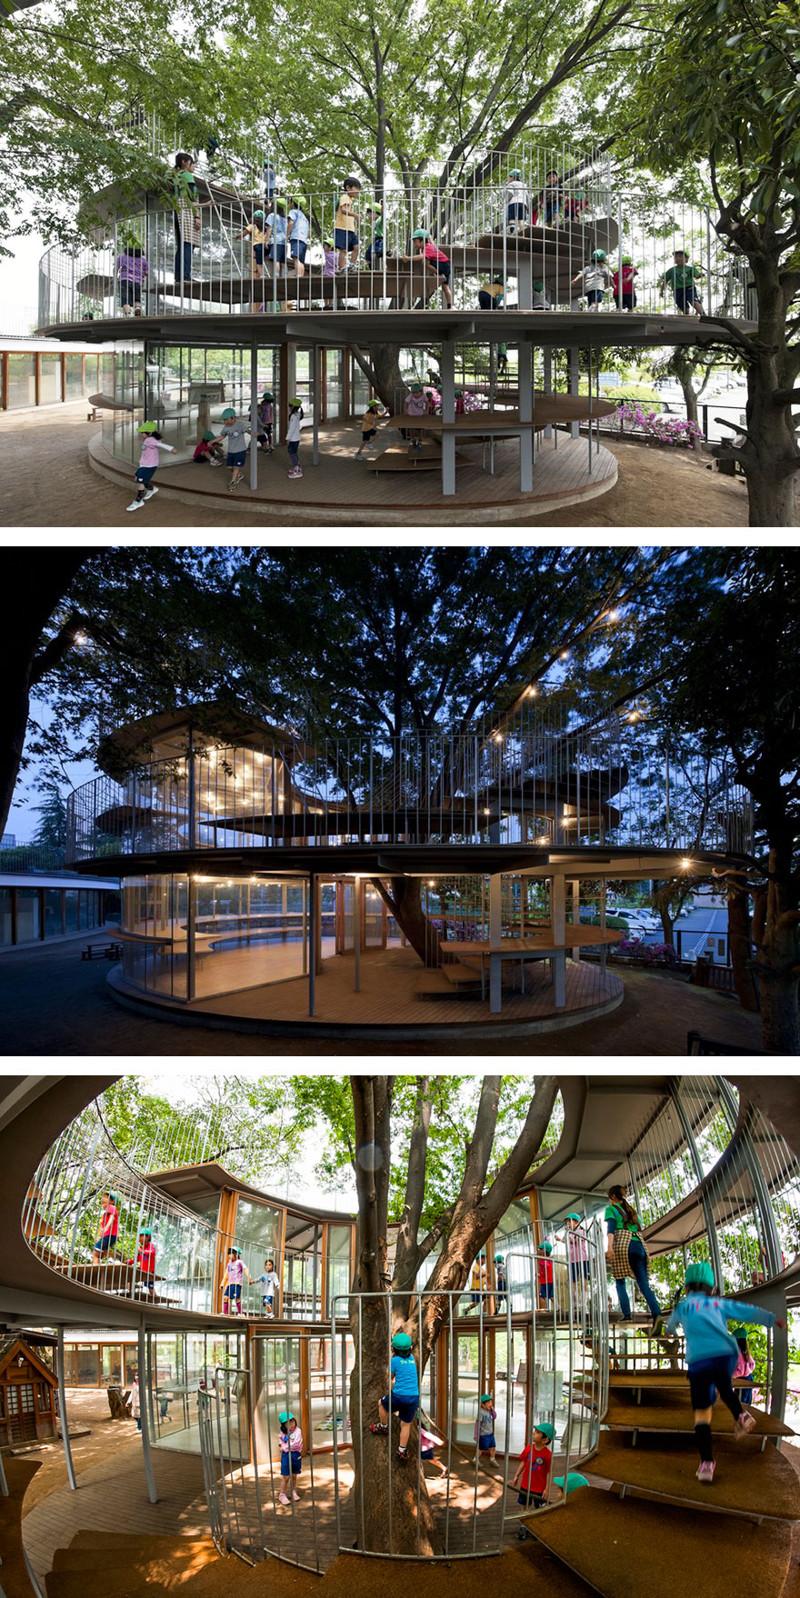 2. Детский сад вокруг дерева дерево, здание